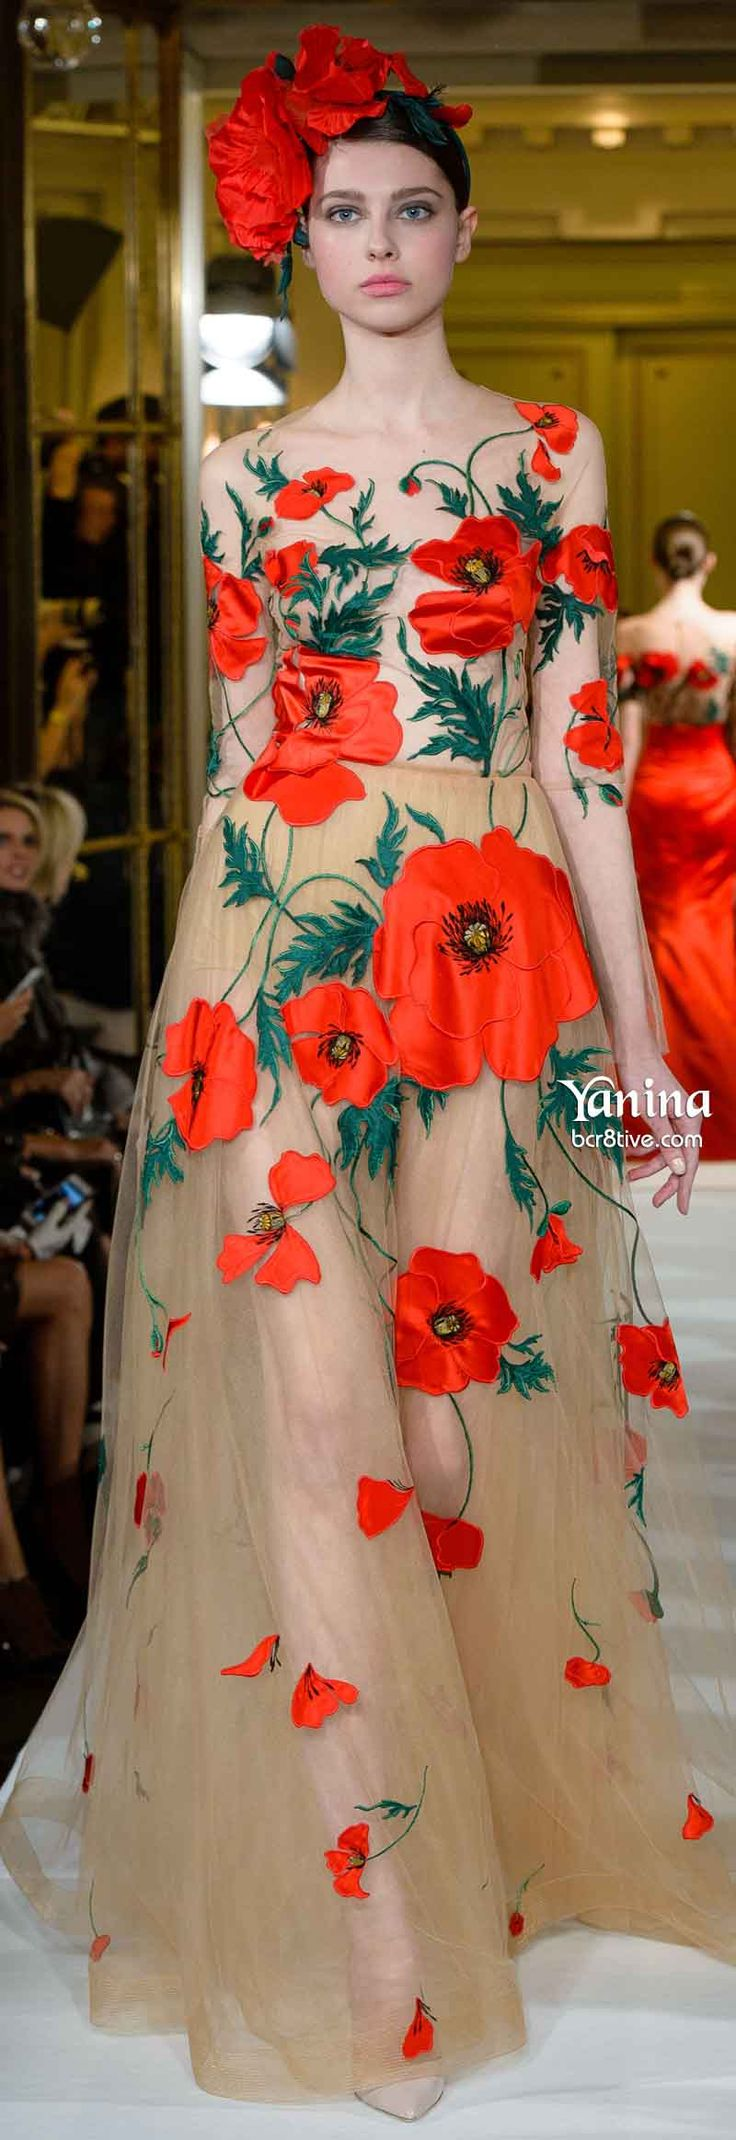 Poppies kiyomi! Poppies! Yanina Spring 2014 Couture| LBV ♥✤ | KeepSmiling | BeStayBeautiful~*~PM